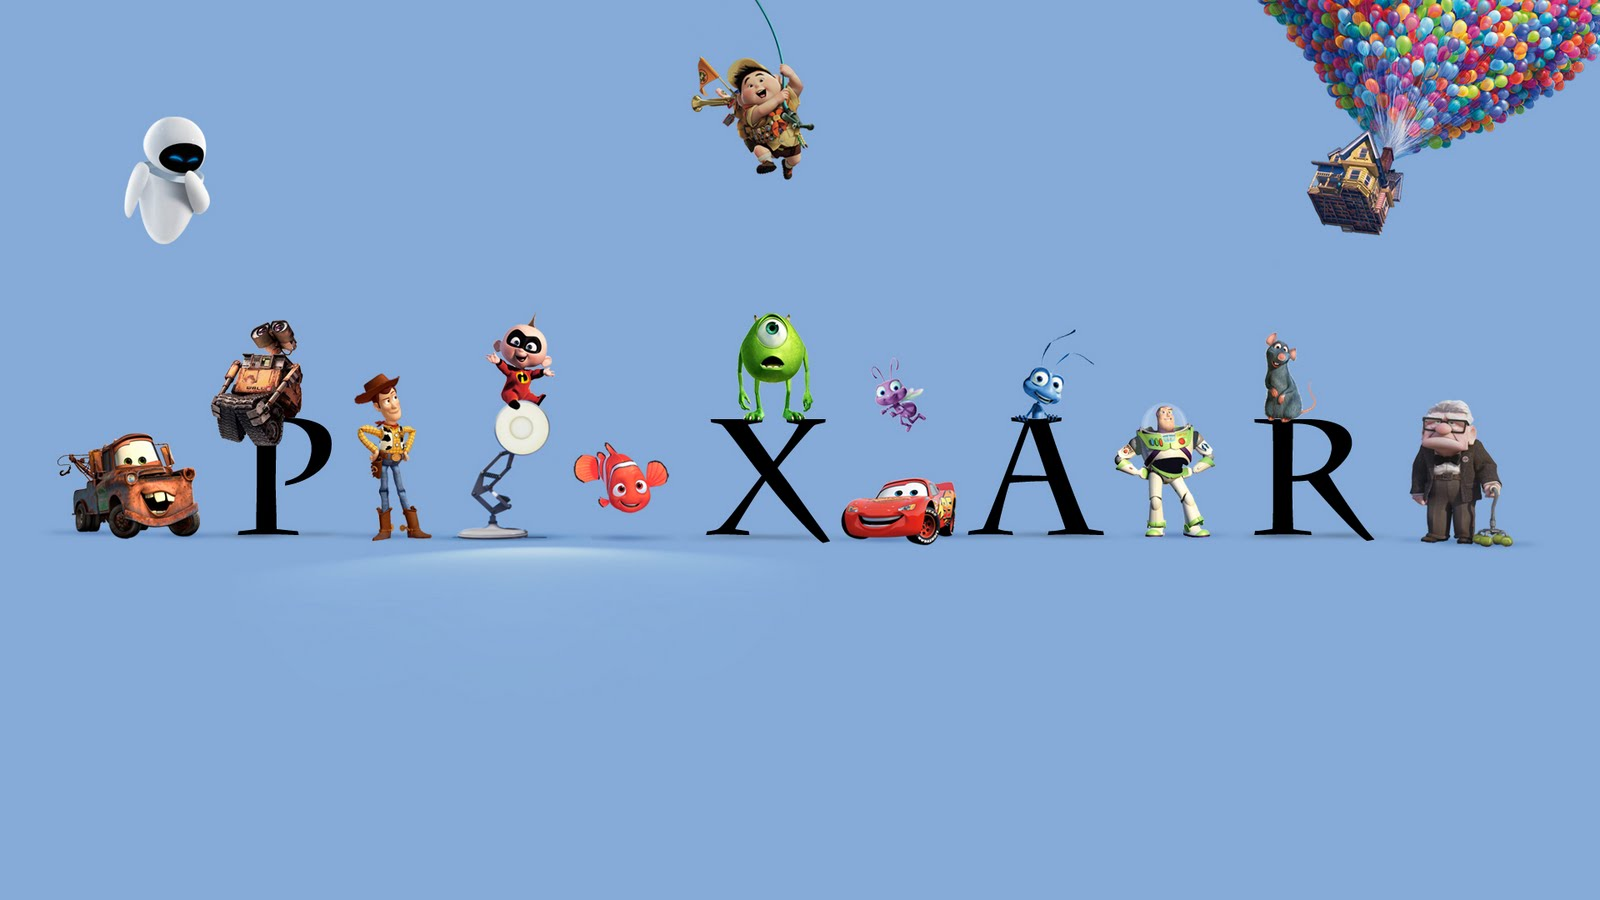 Pixar Animation Studios Logo and characters